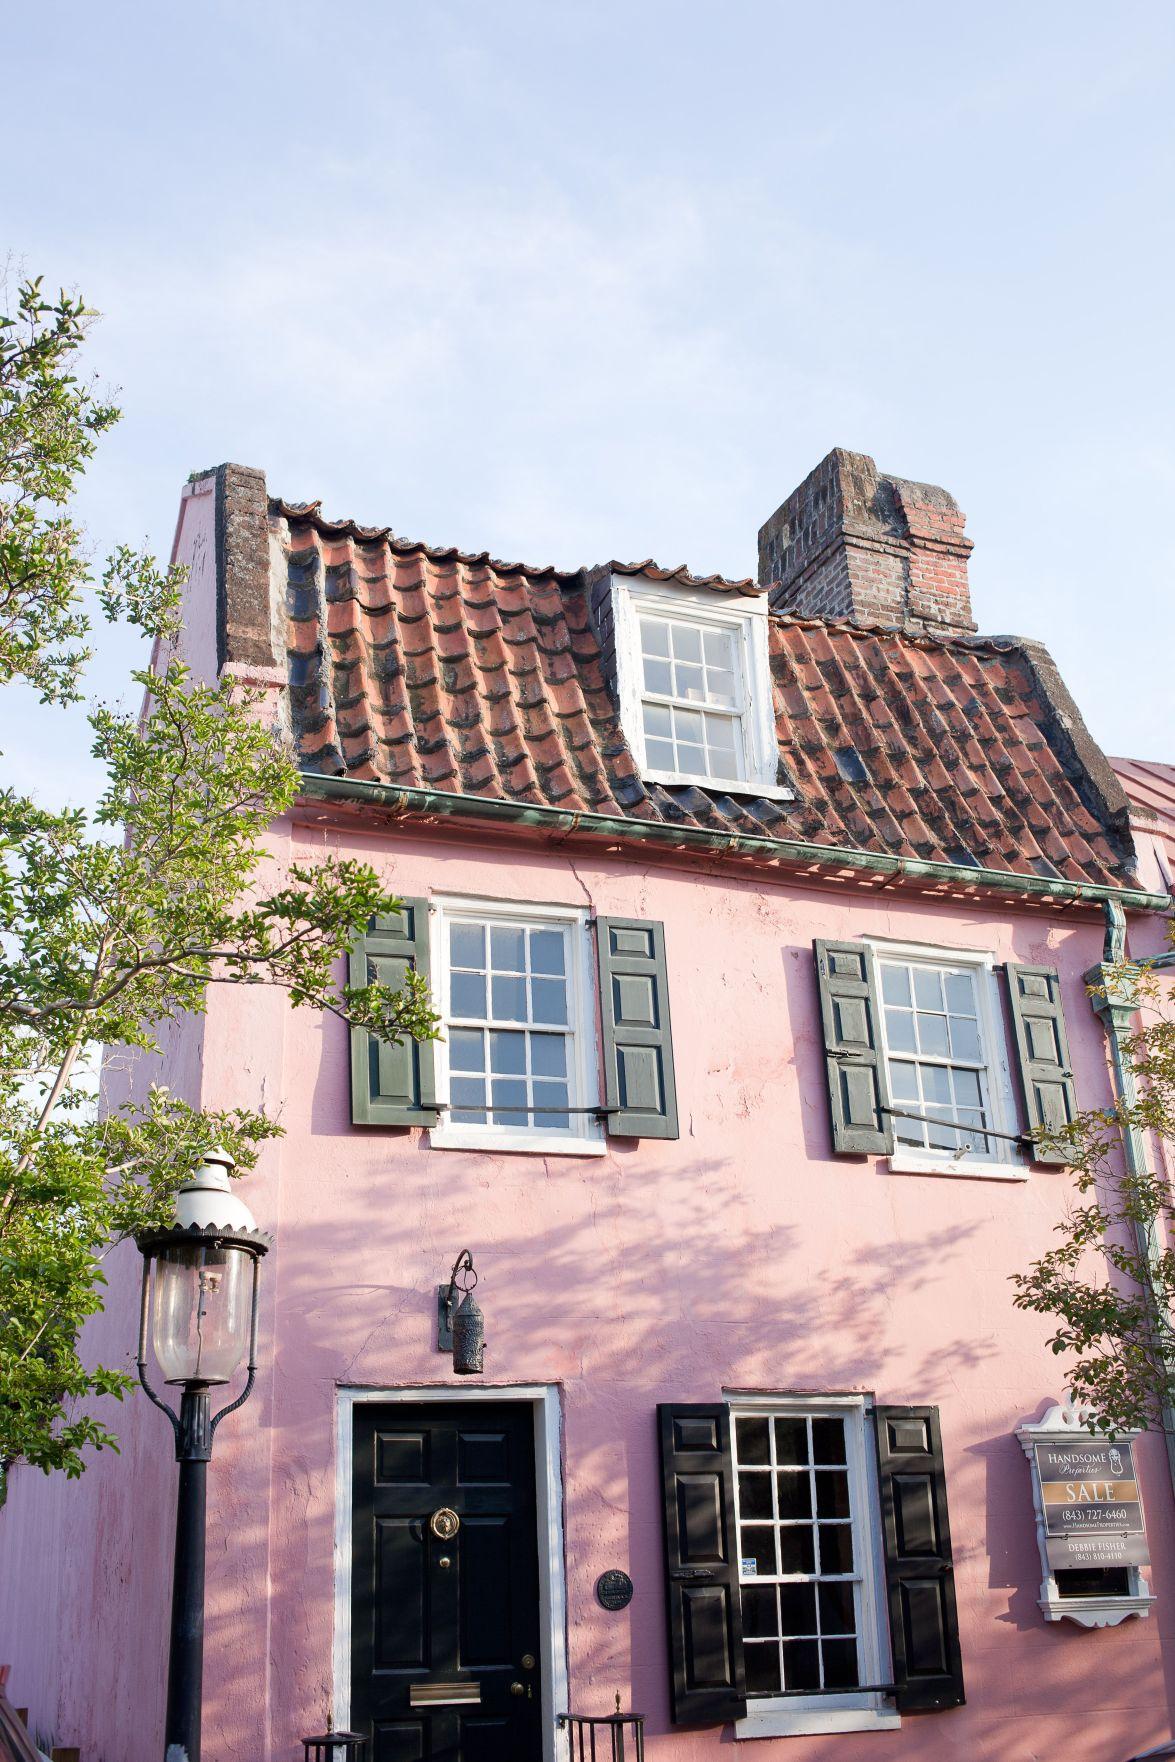 Lap Of Luxury: Charleston area commands resurgent market of historic haunts, sprawling spectacles